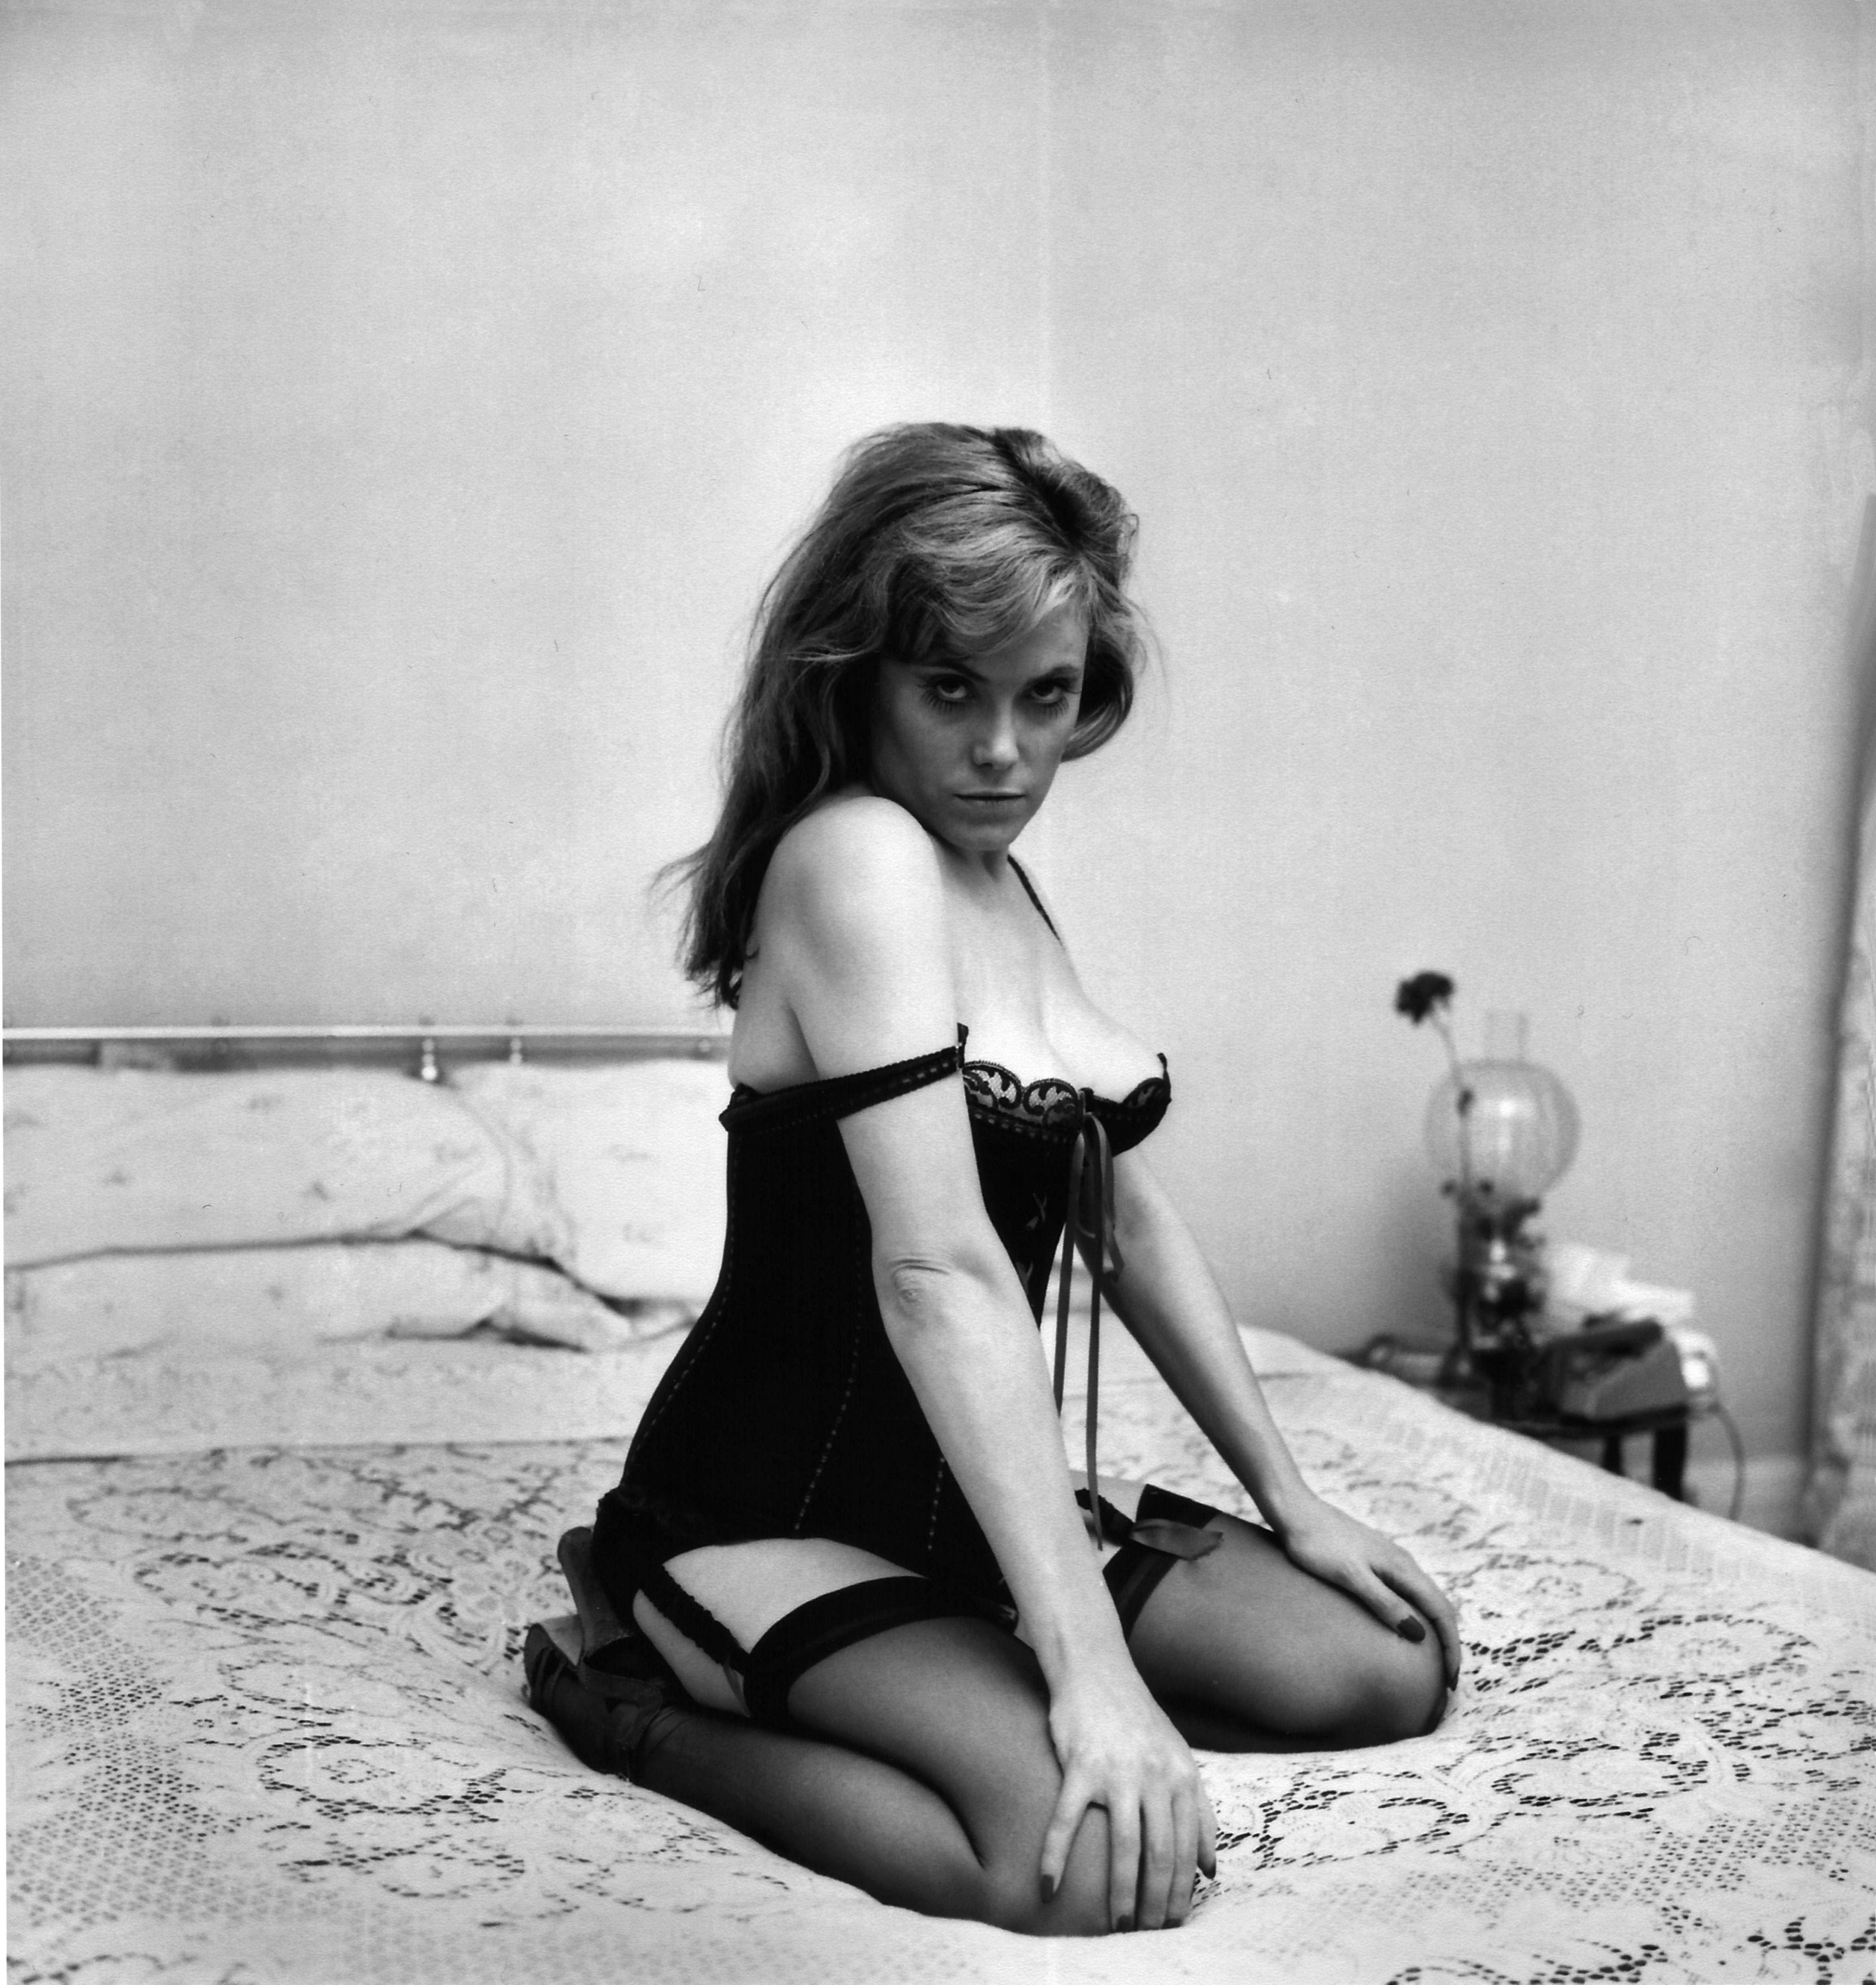 Wendy Richard nudes (79 photo), Sexy, Hot, Twitter, panties 2020